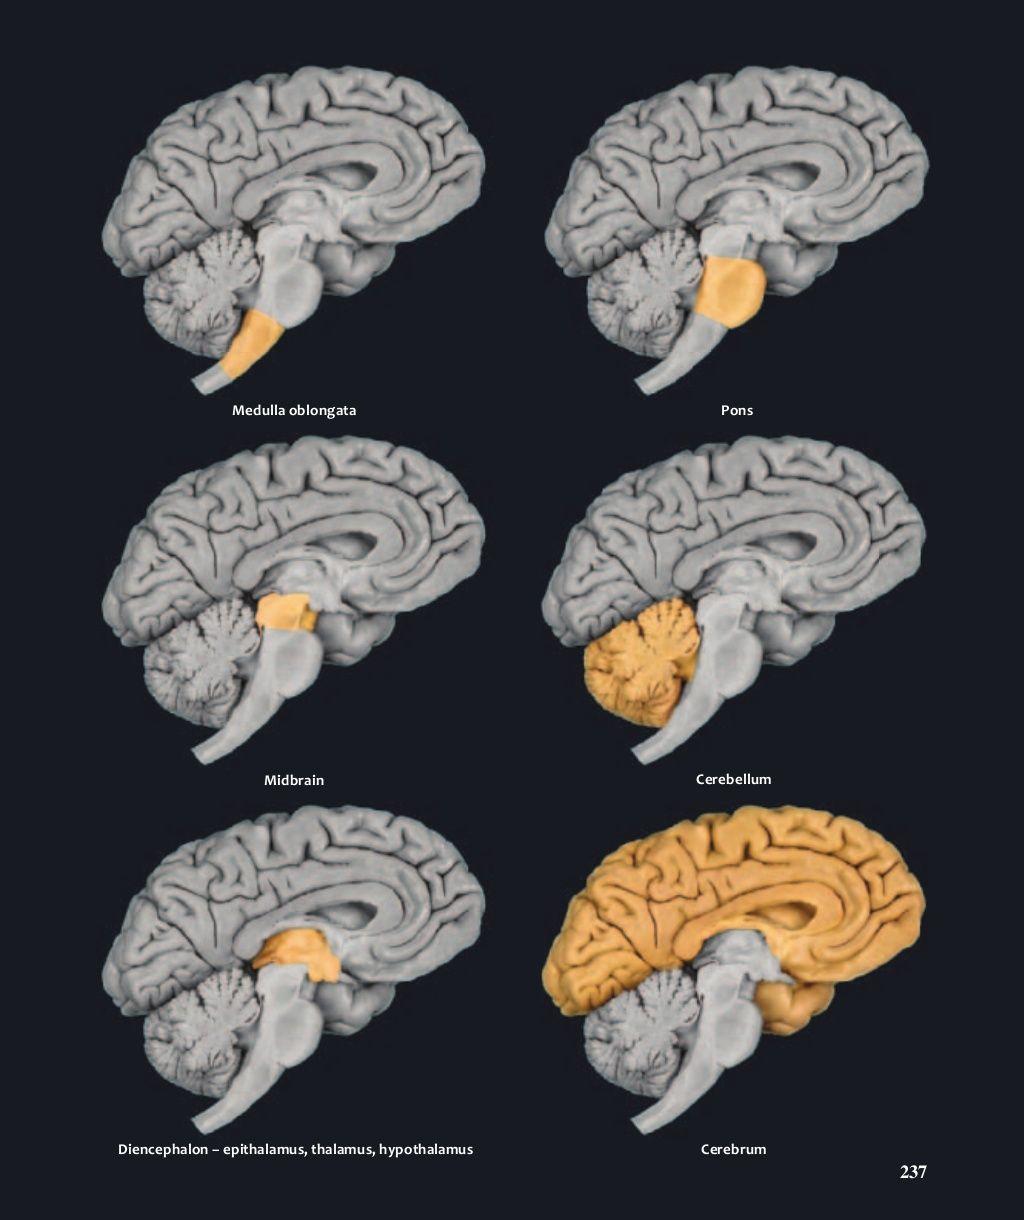 Atlas of human anatomy mark nielsen   Brain   Pinterest   Human ...